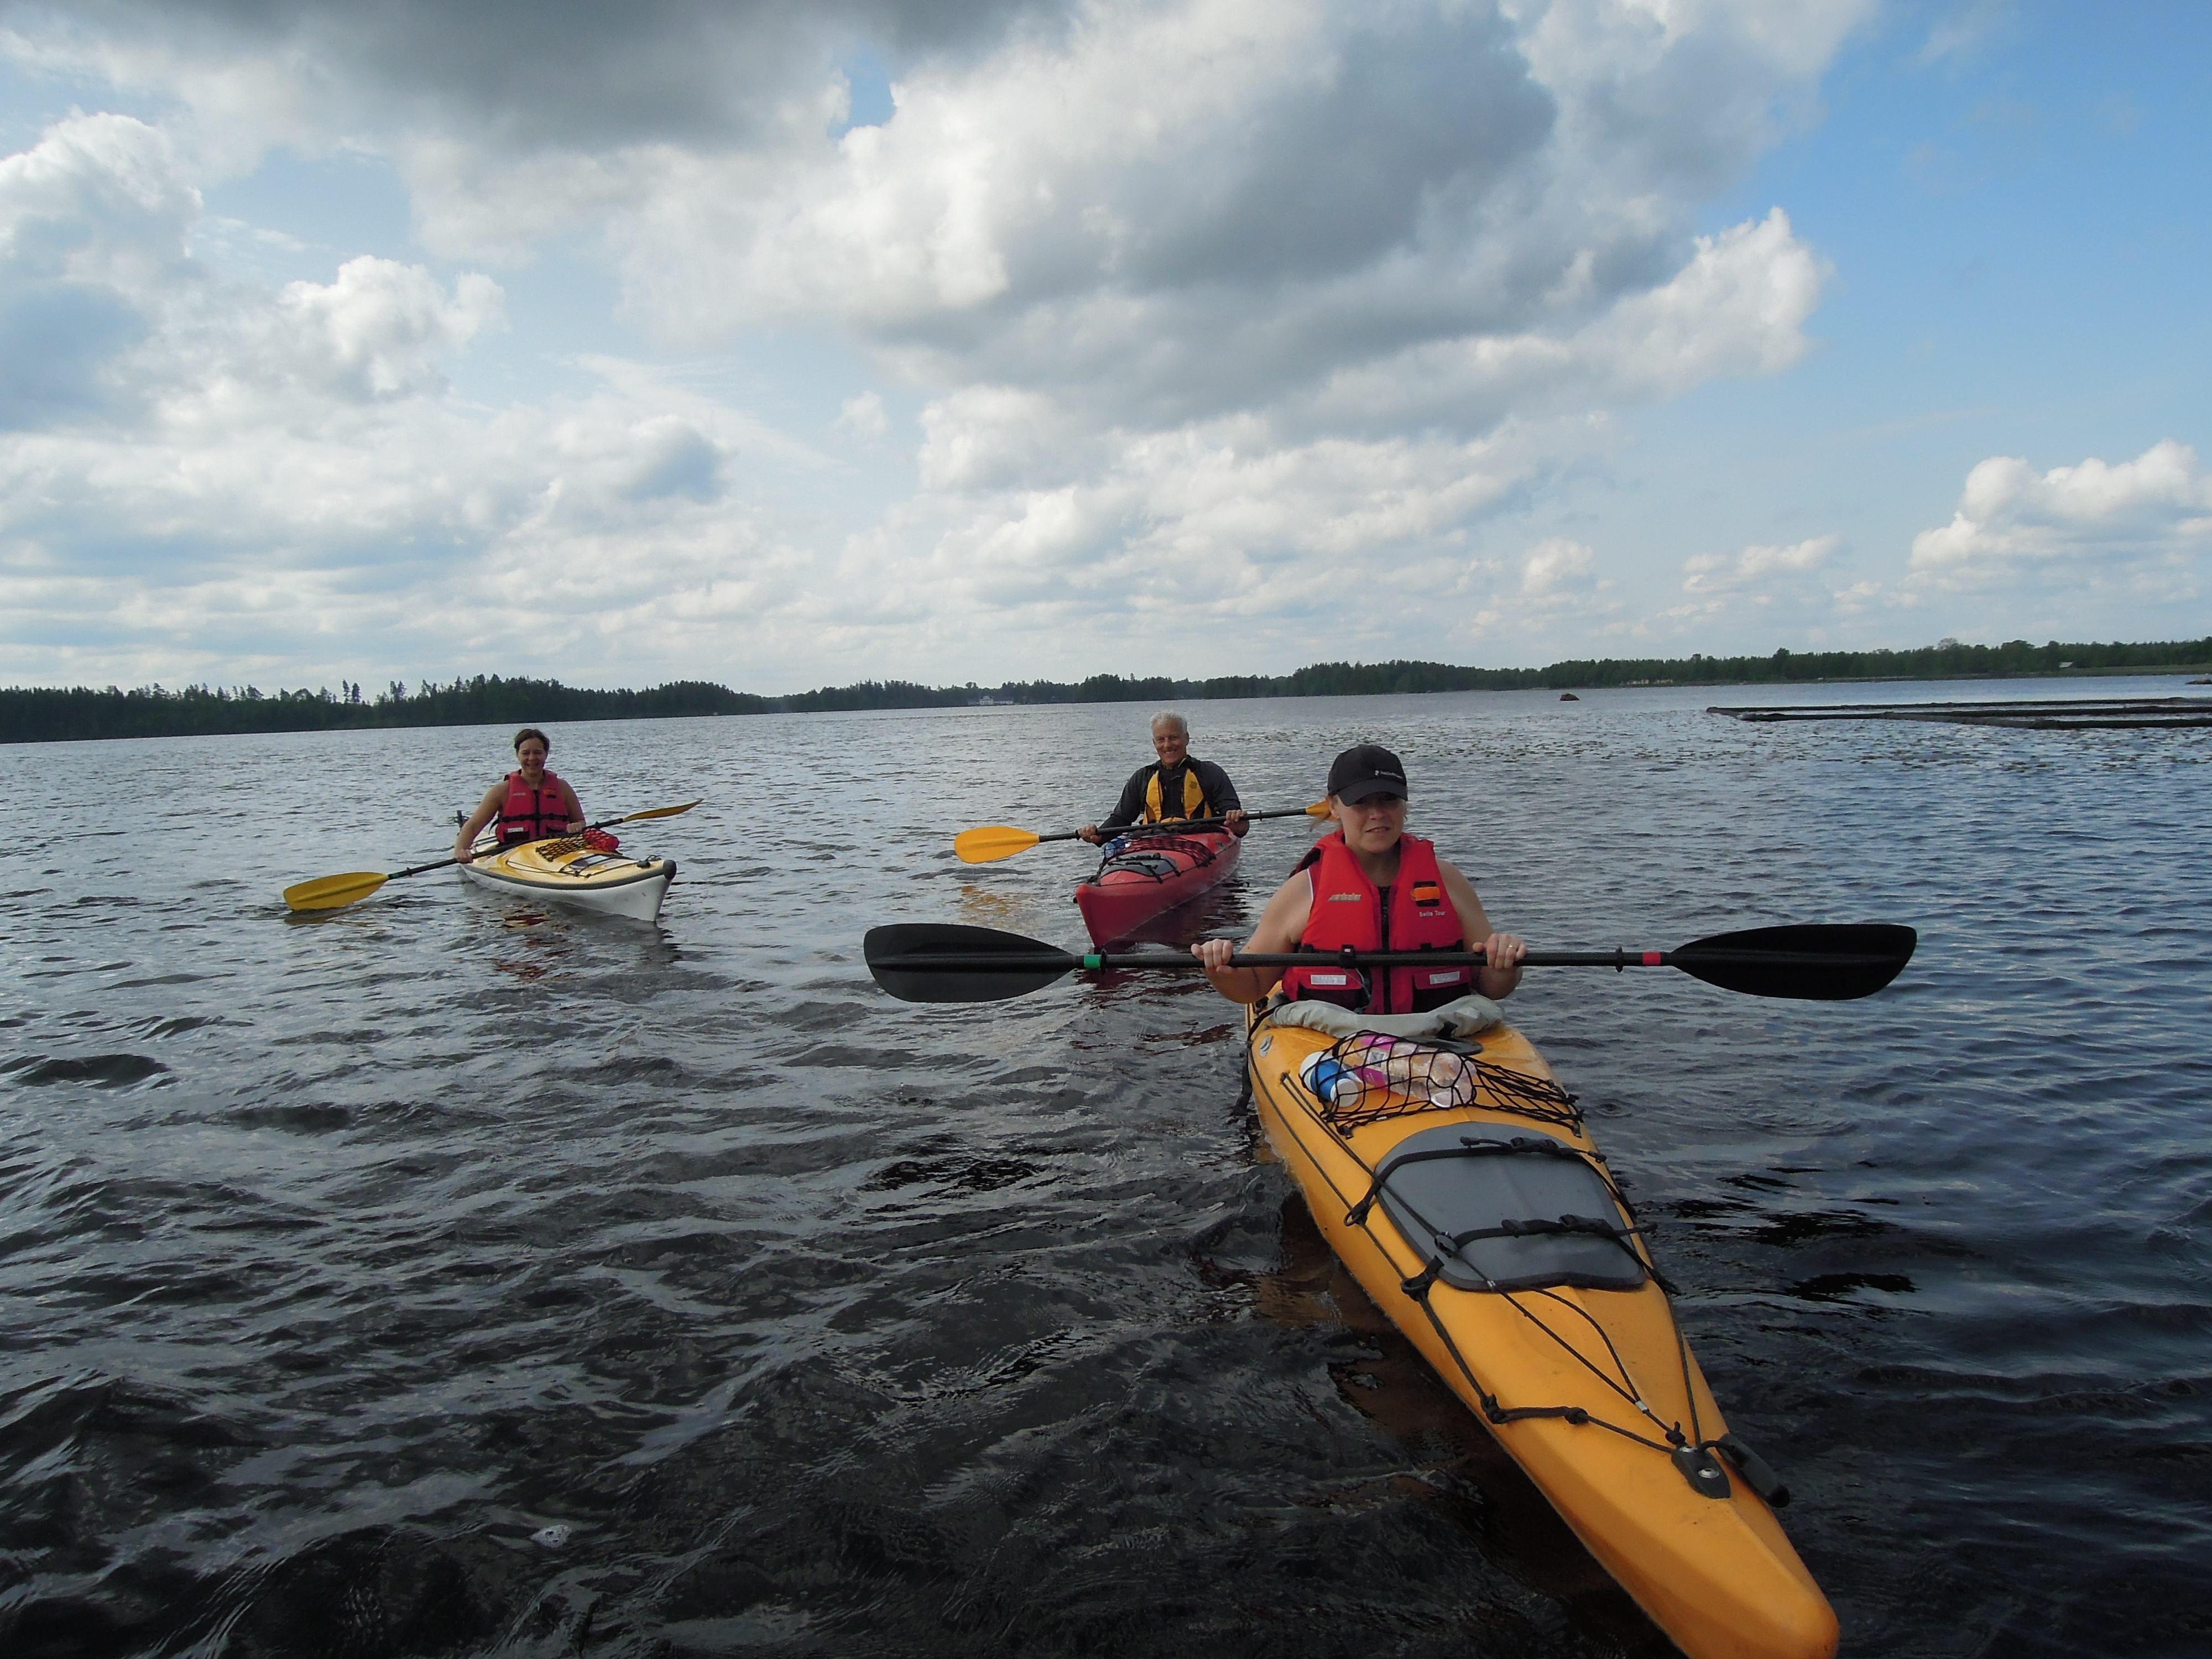 © http://www.ursulasaventyr.se/, Boots- und Kanuverleih Ursulas Abenteuer//Norraryds Camping